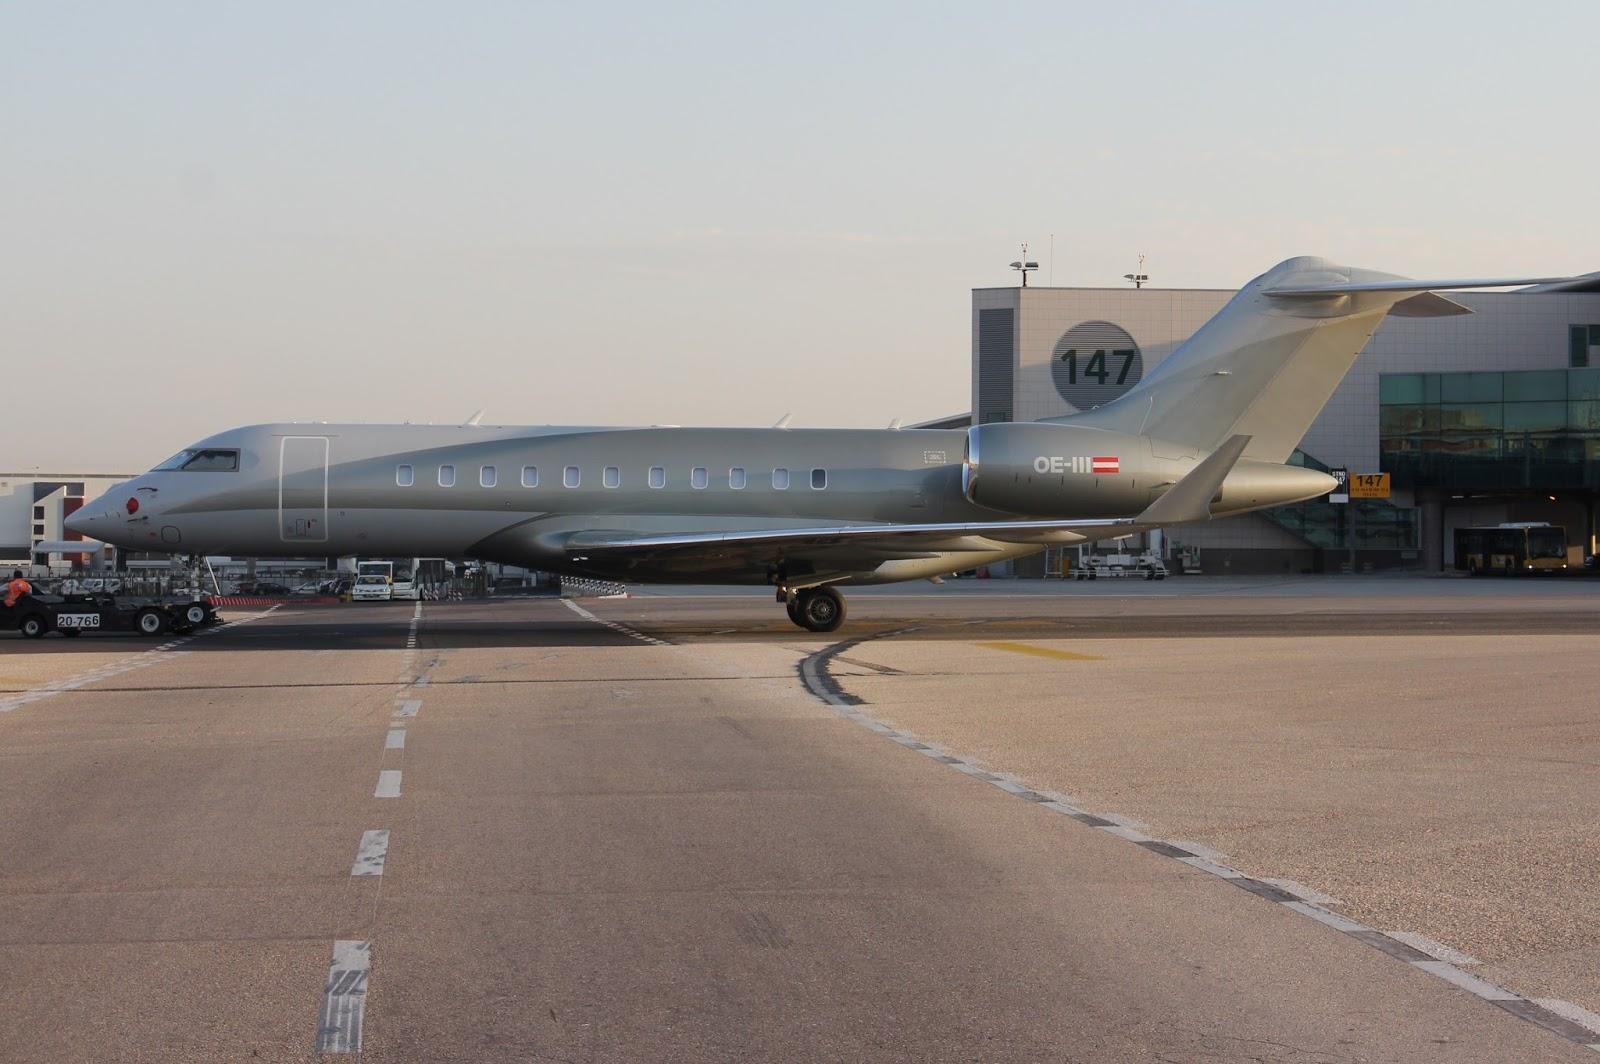 Jet Privato Niki Lauda : Flyingphotos magazine executive aviation oe iii cn